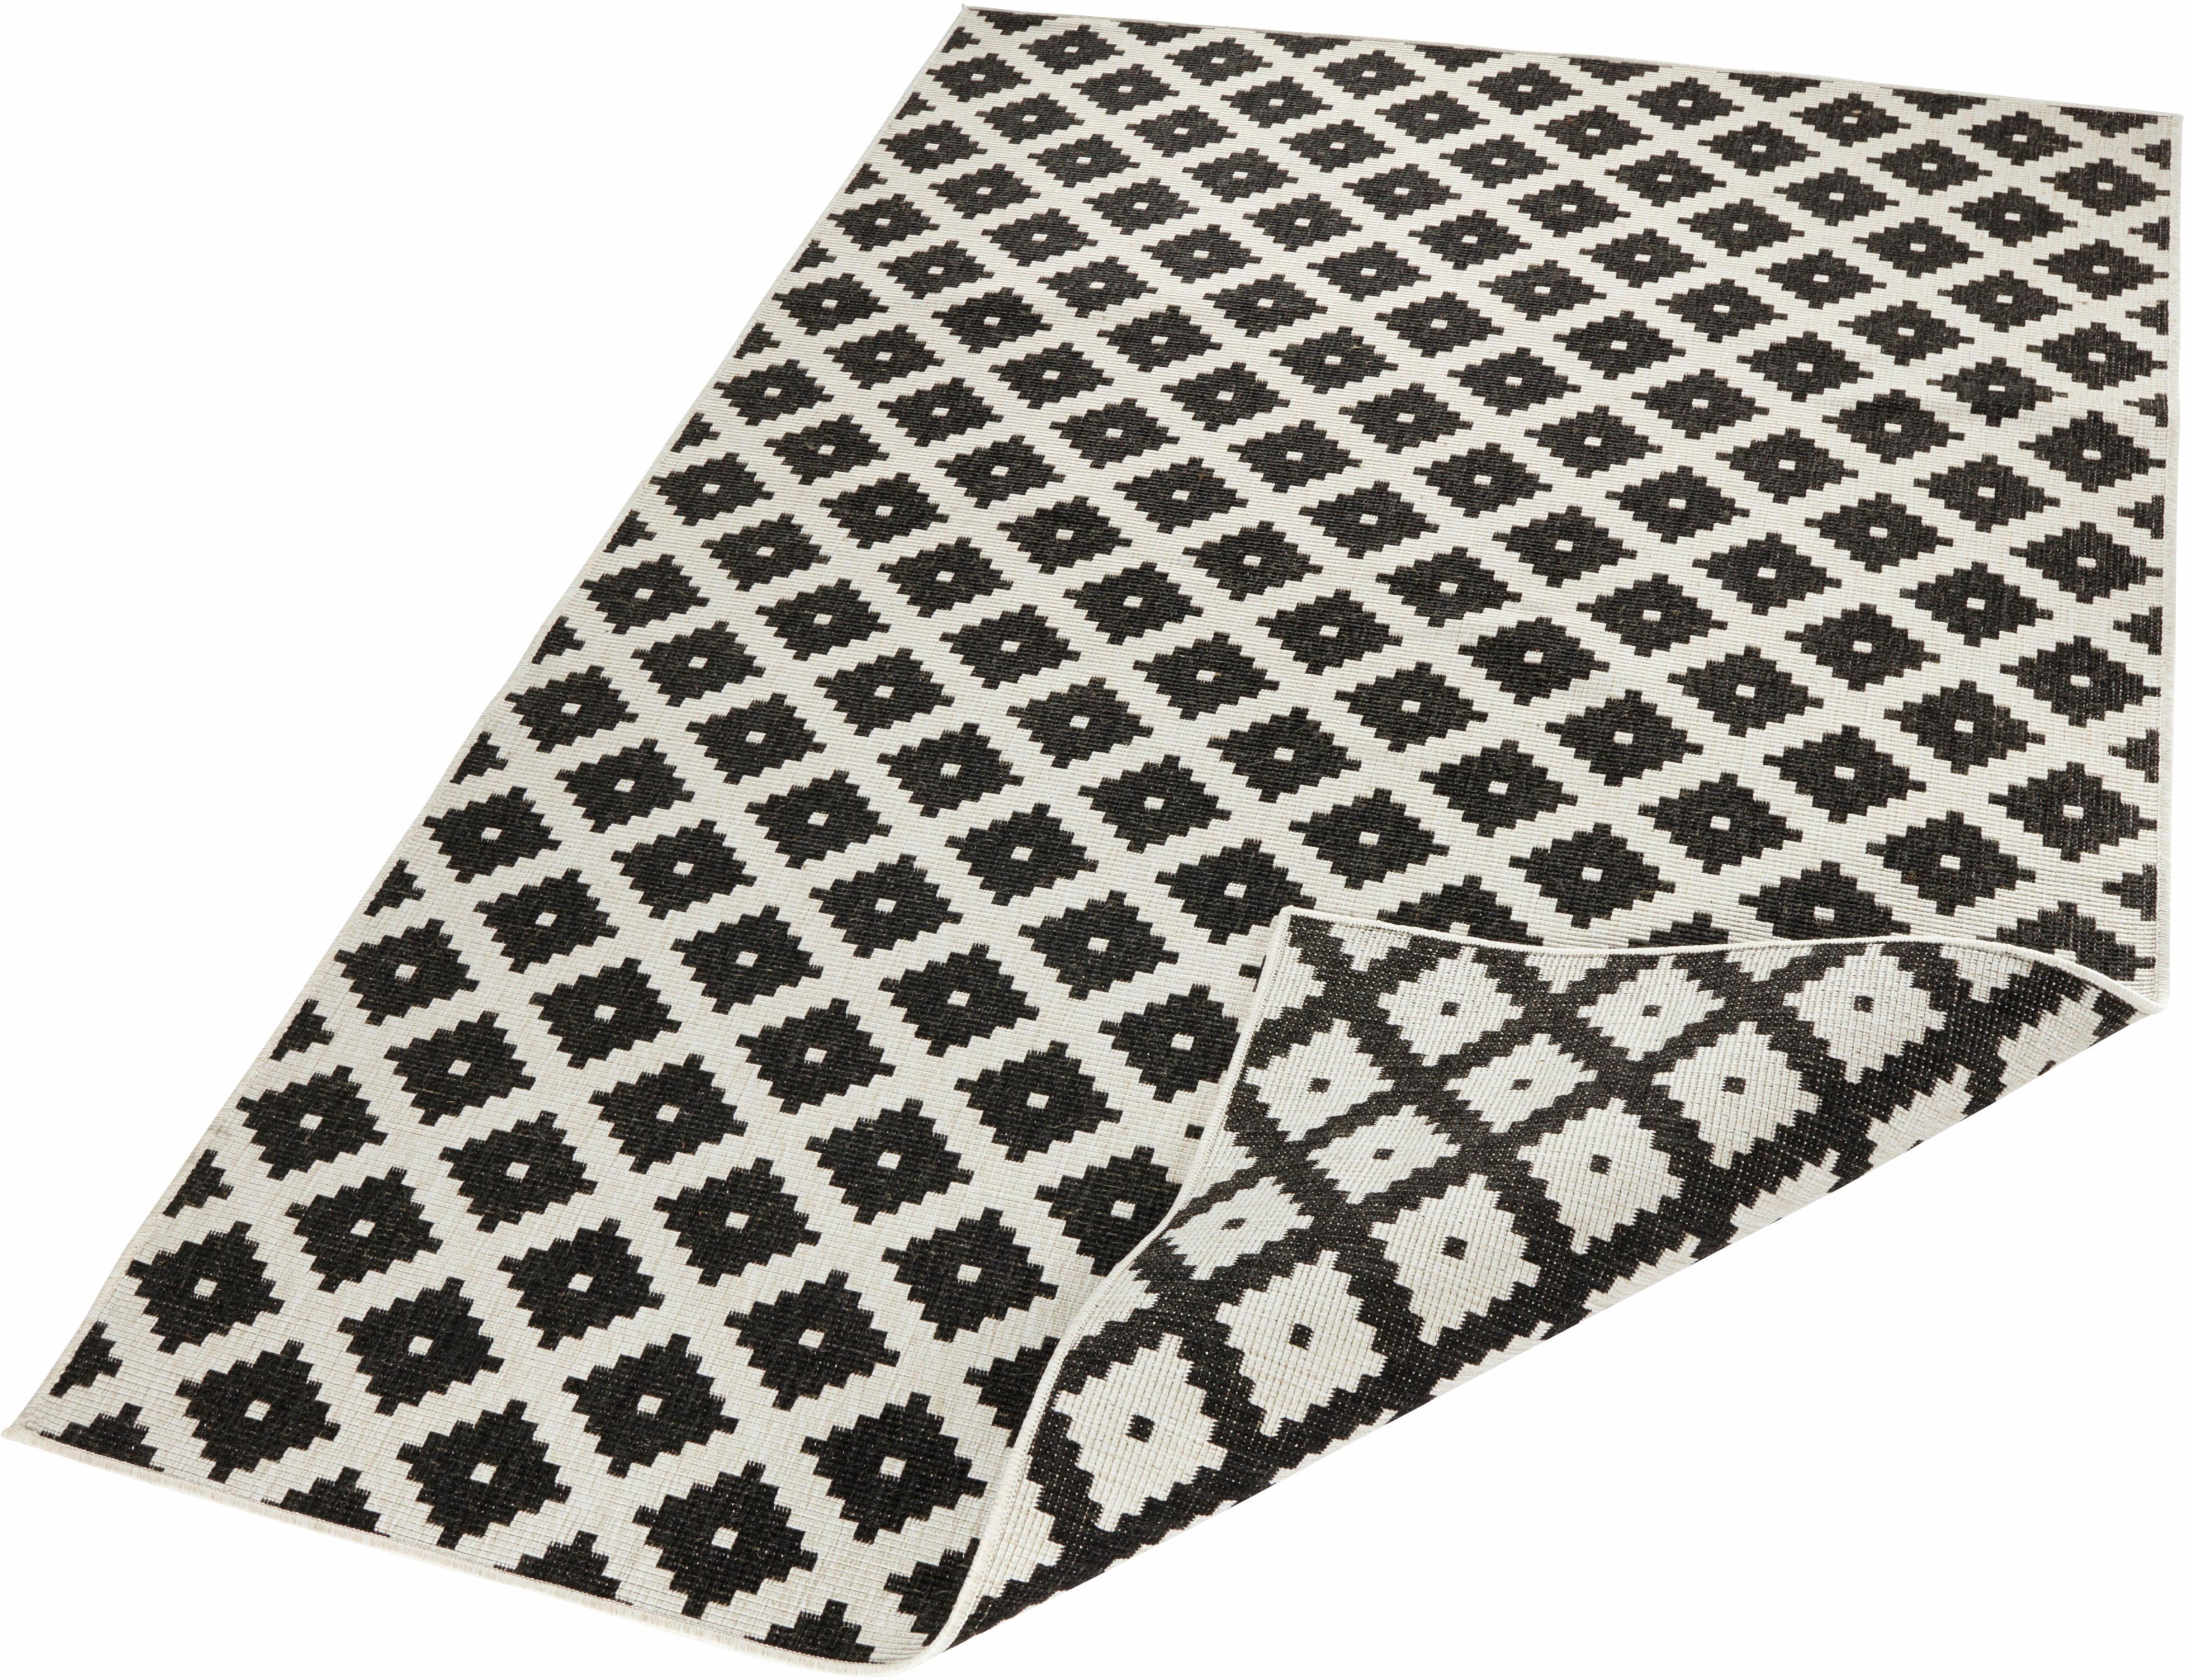 Teppich Nizza bougari rechteckig Höhe 5 mm maschinell gewebt